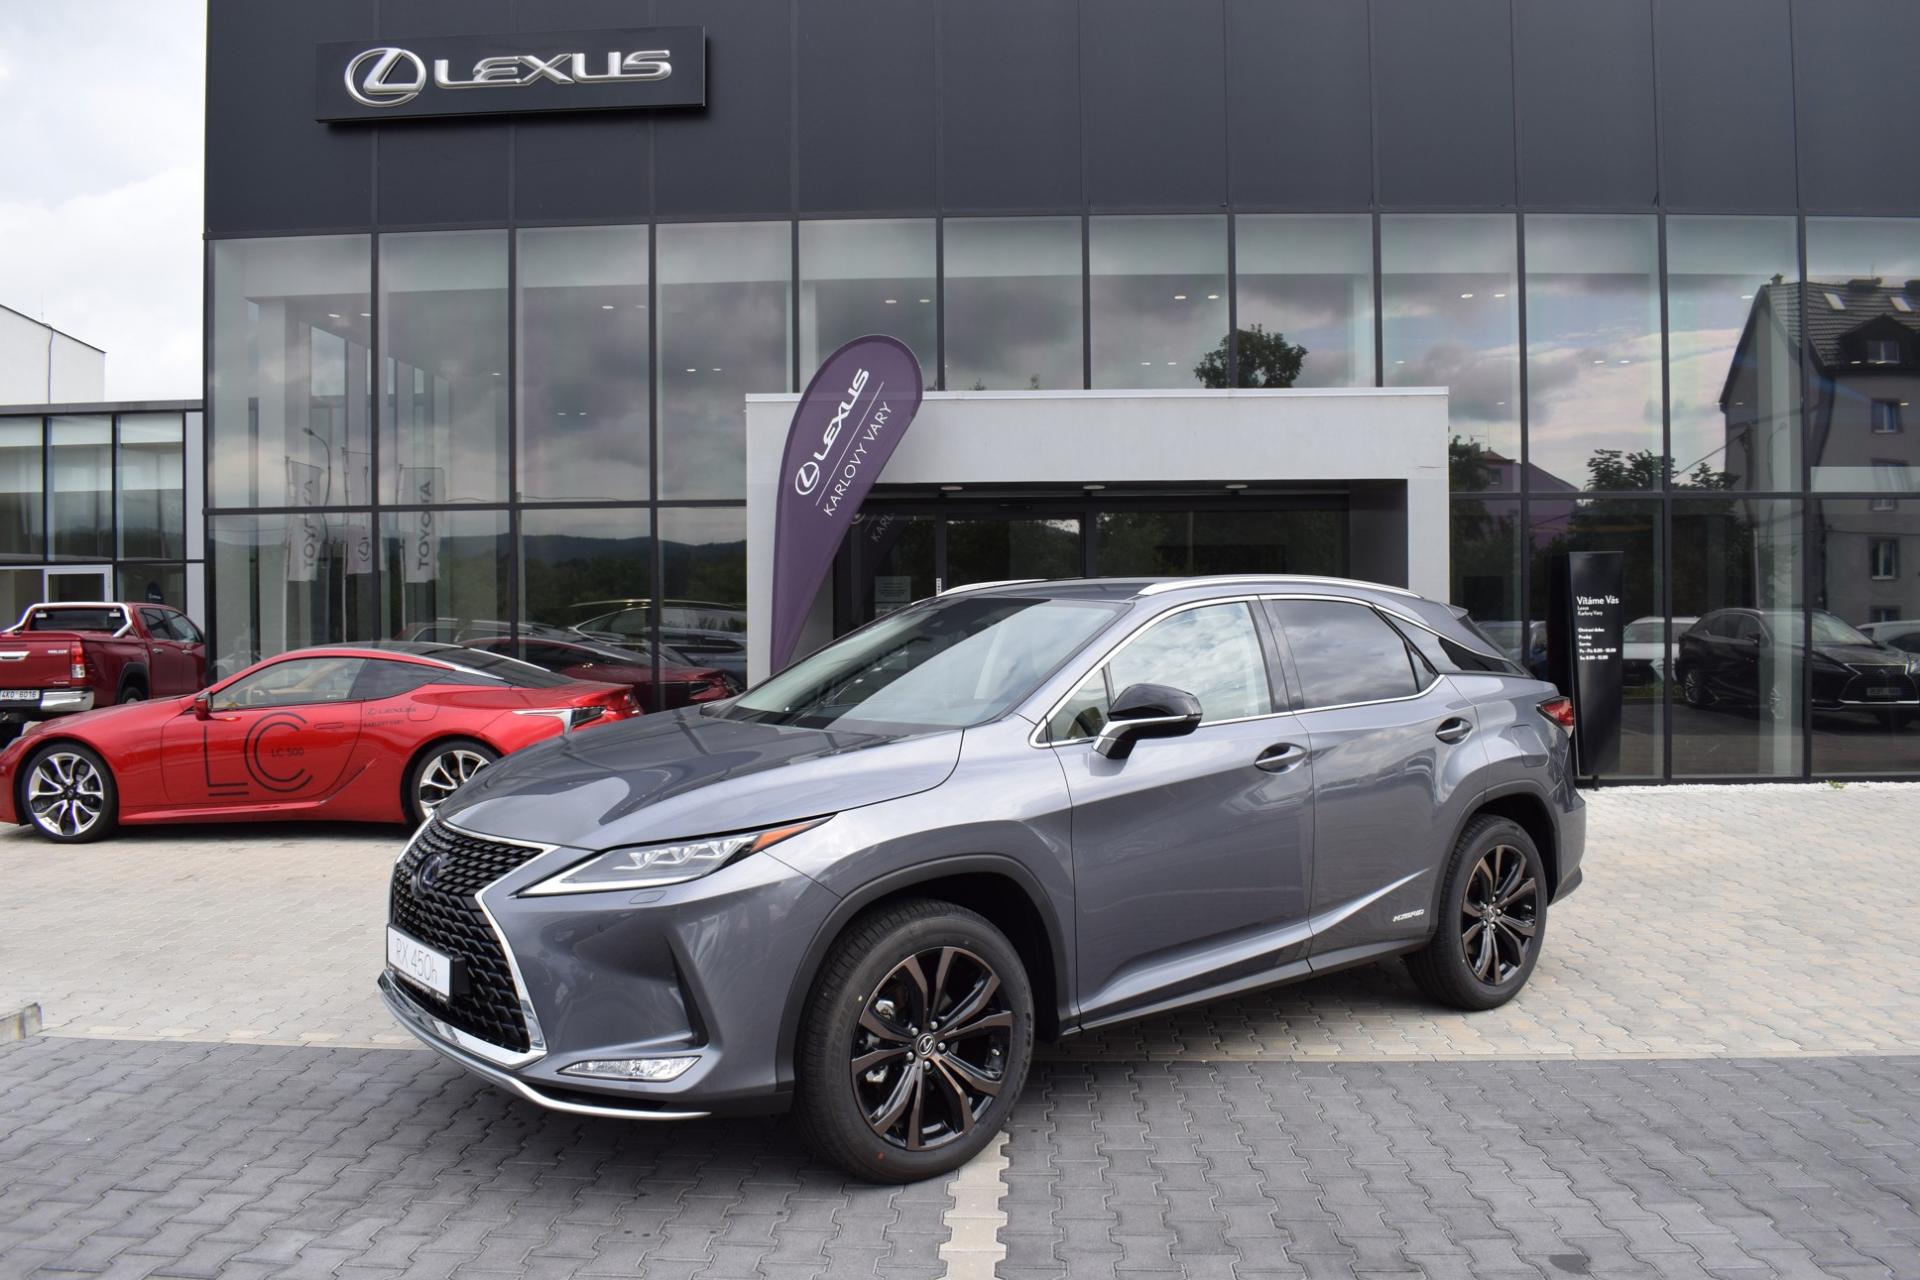 Lexus RX COMFORT EDITION 3.5L Petrol Hybrid (313 k) aut. CVT